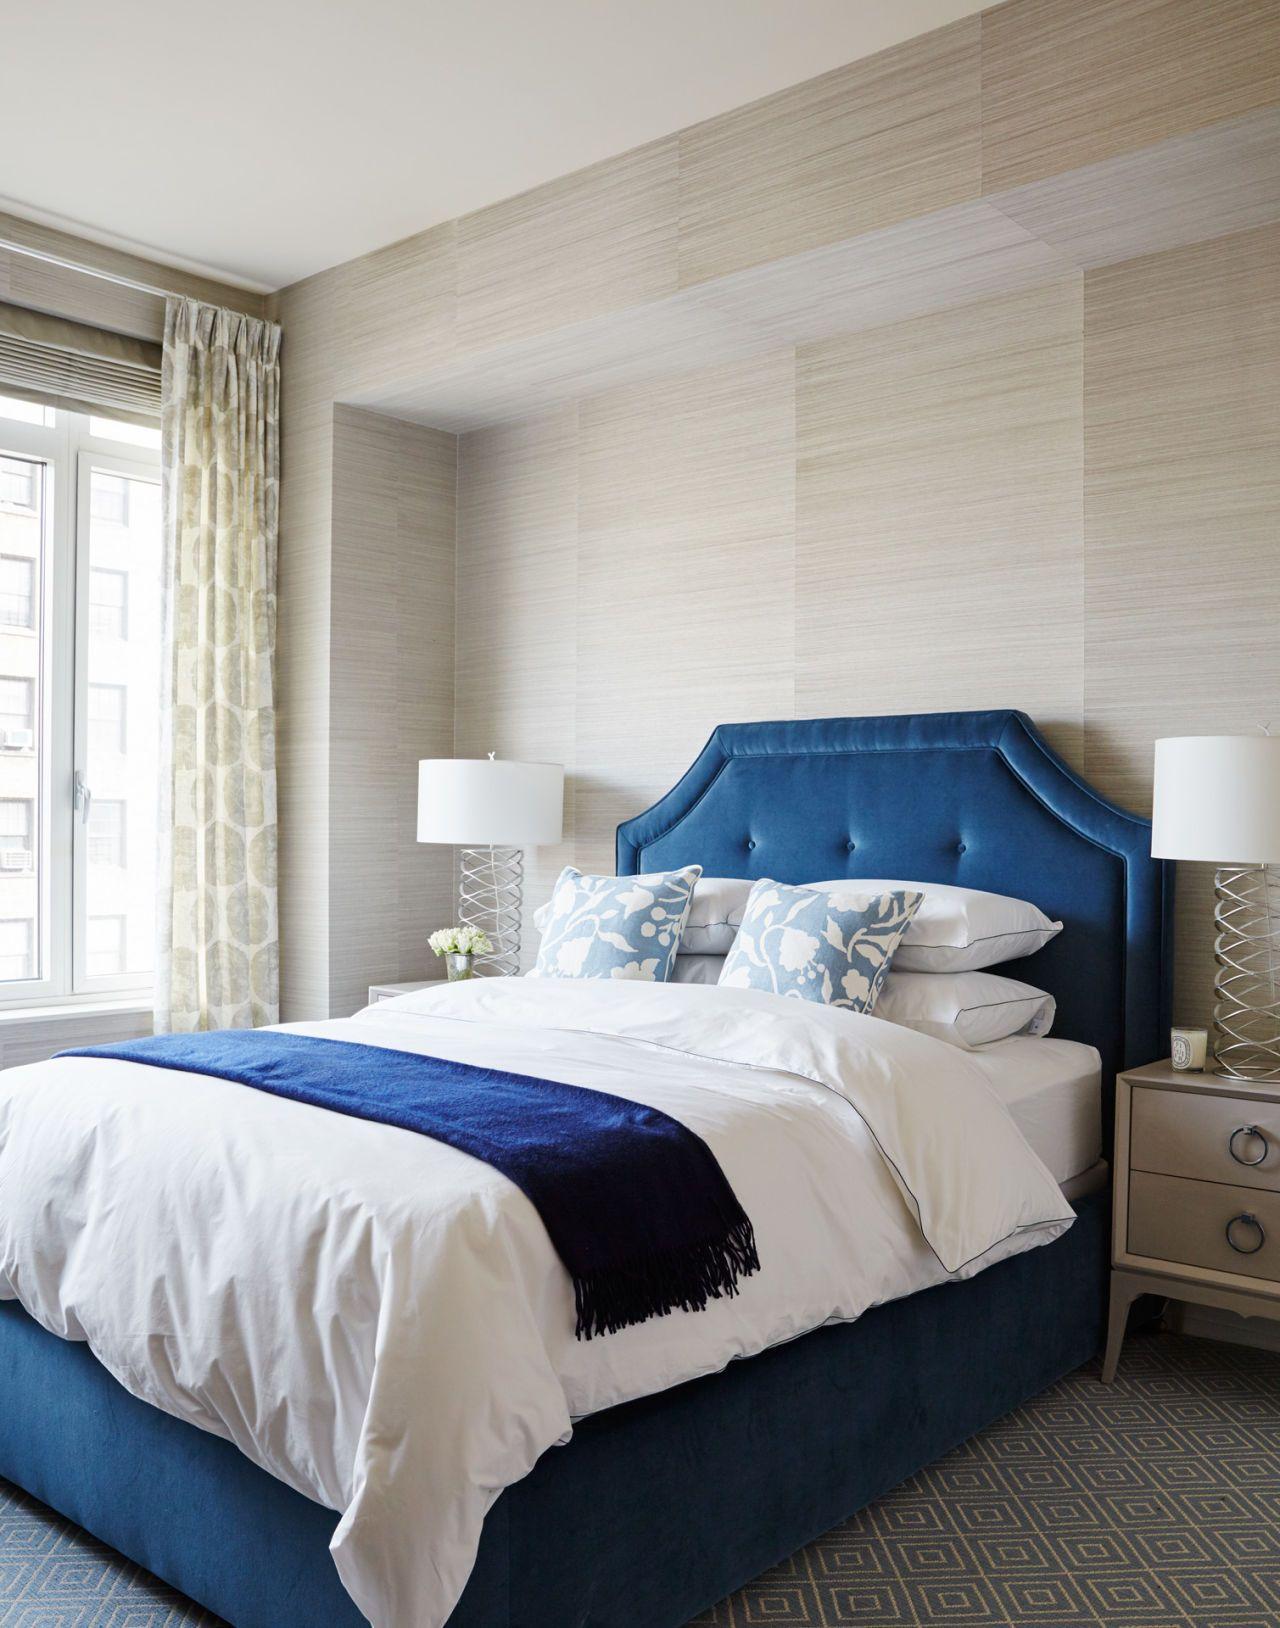 stunning bedroom stunning bedrooms 10 Secrets For Creating Unbelievably Stunning Bedrooms shot 11 108